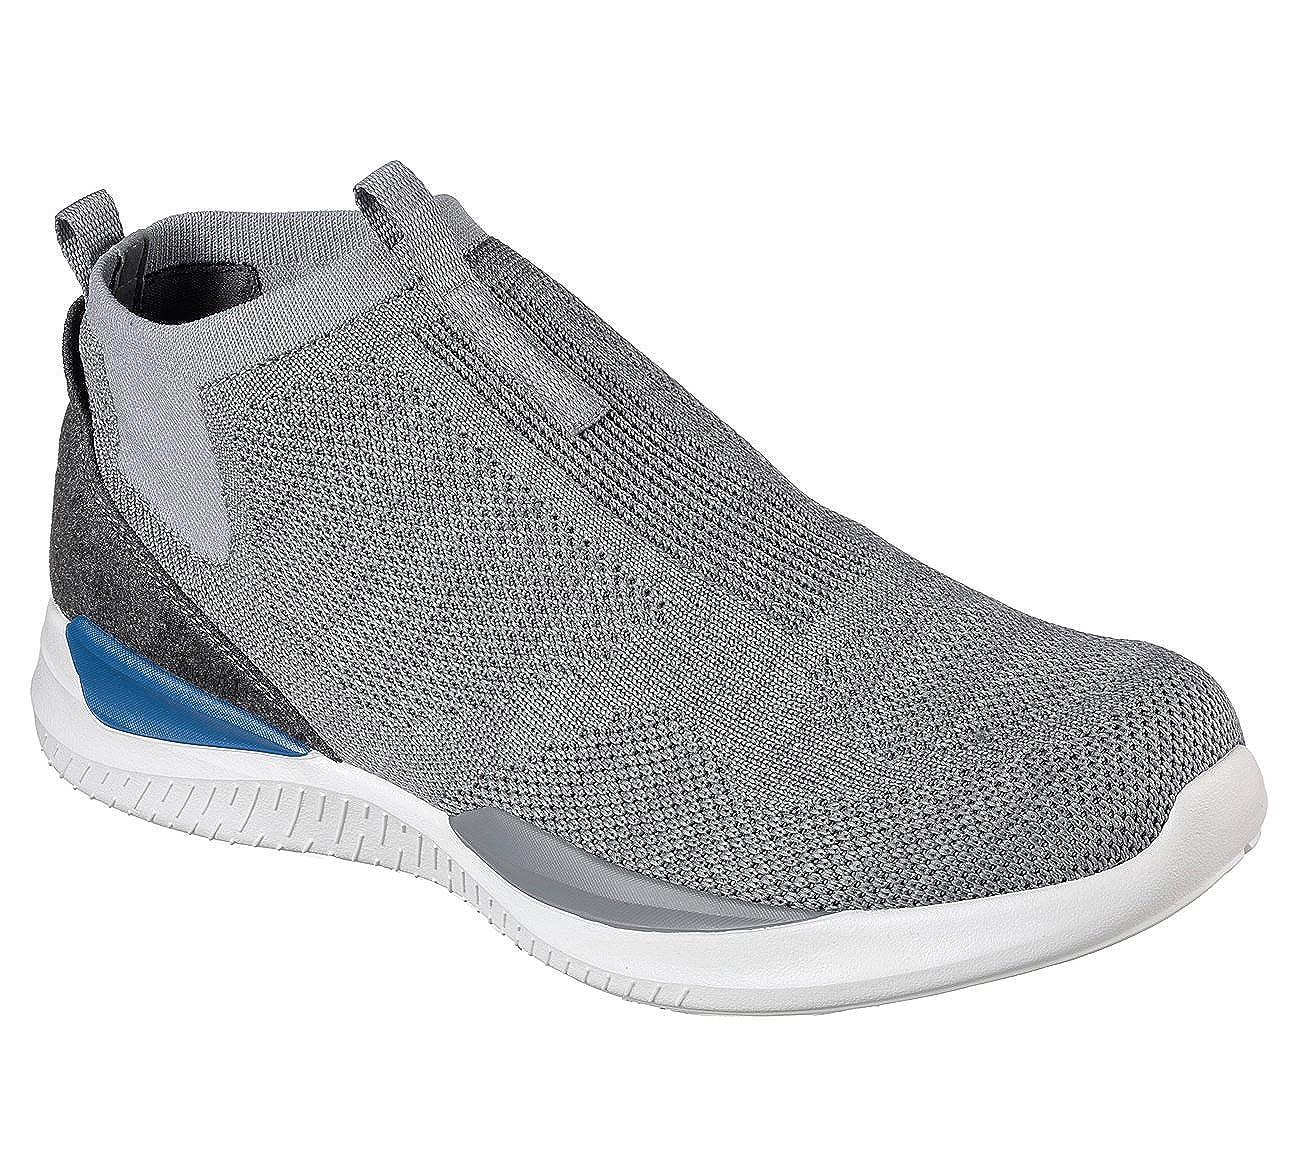 Skechers Mens Matrixx Mesday Slip-On Shoe